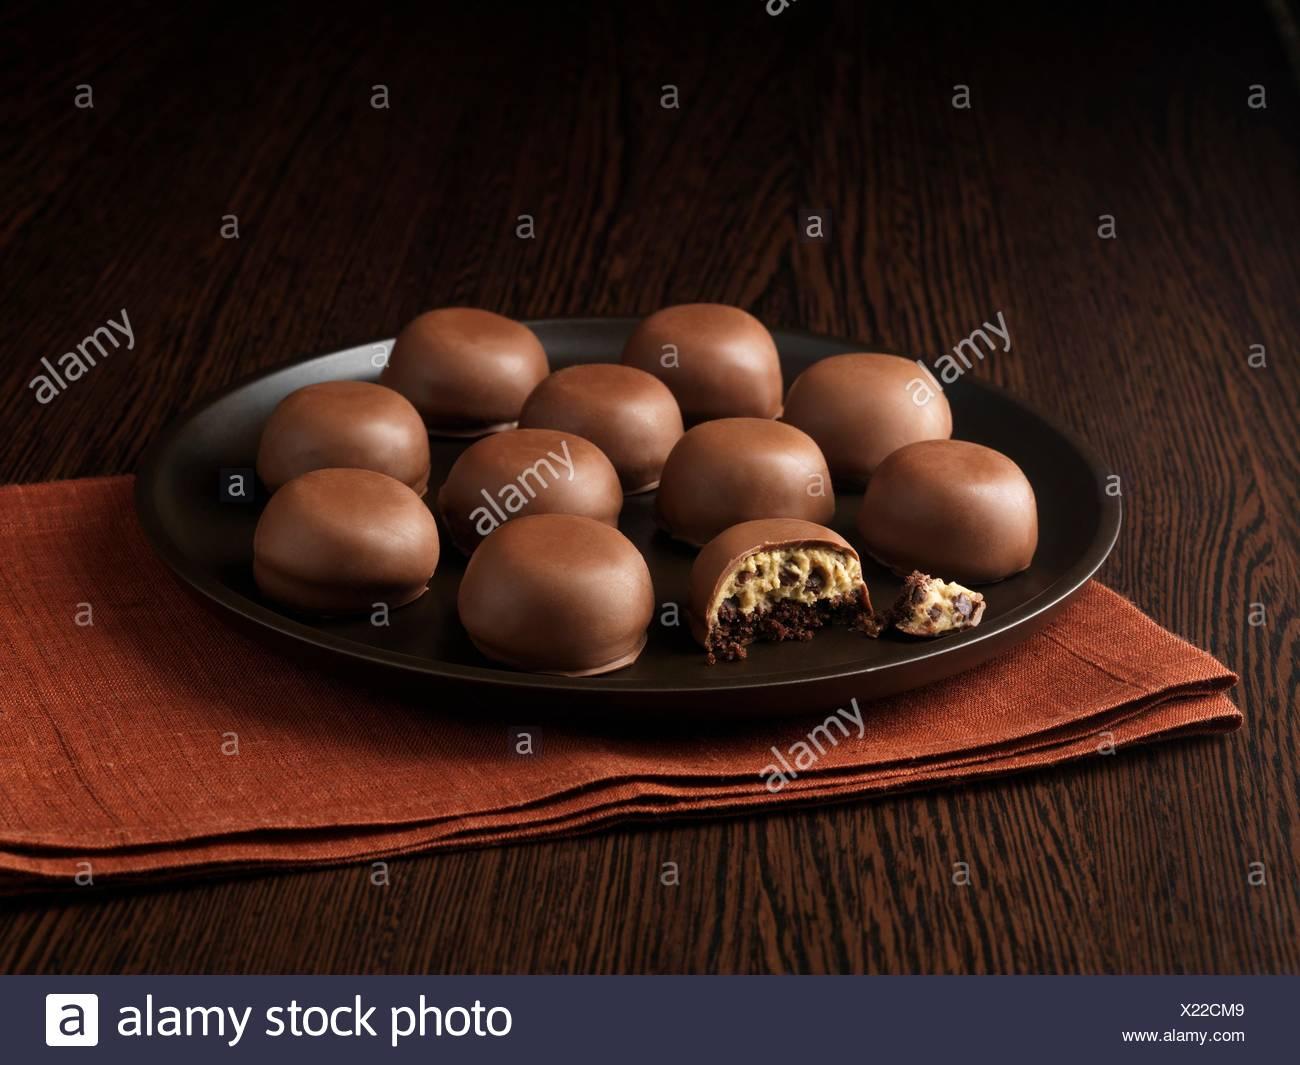 Chocolate tiramisu mini bites on ceramic plate - Stock Image